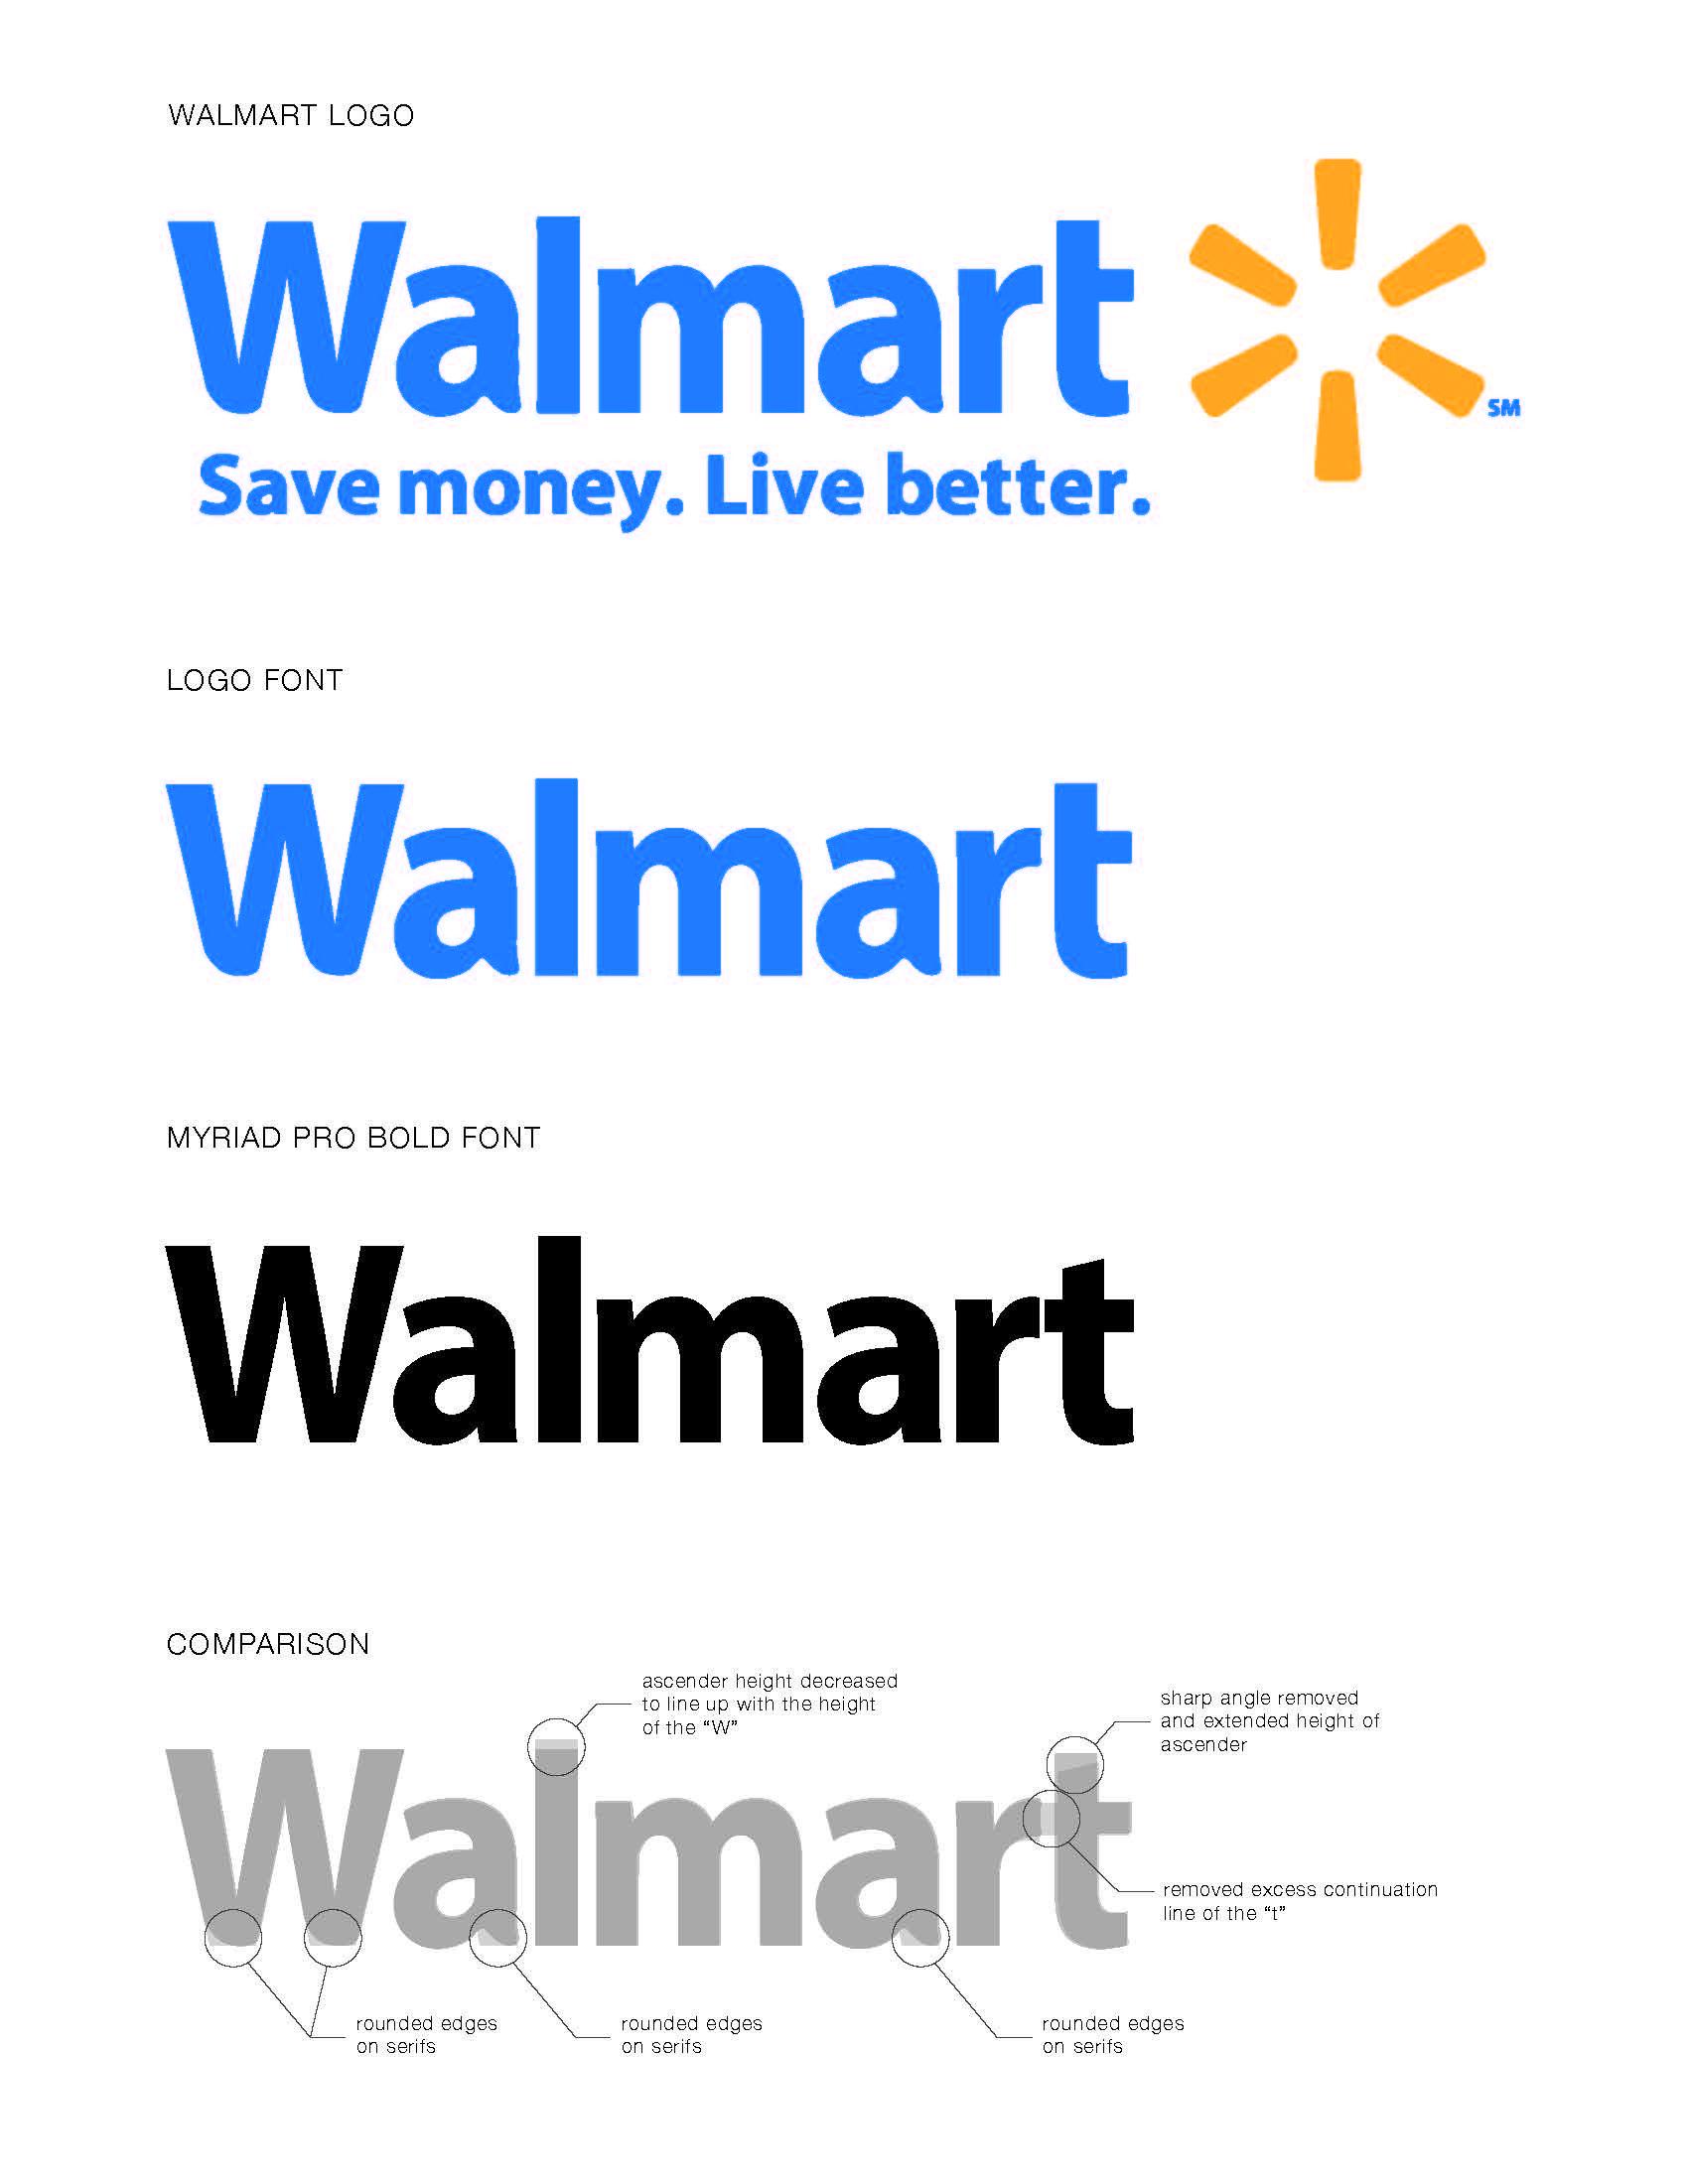 9f384c286e Walmart logo comparison Walmart Logo